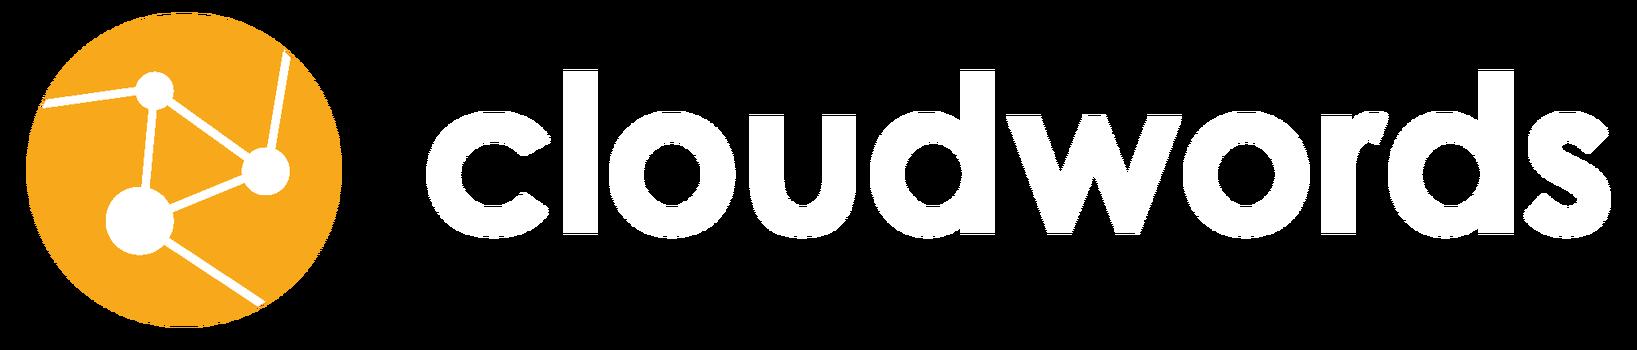 Resources logo